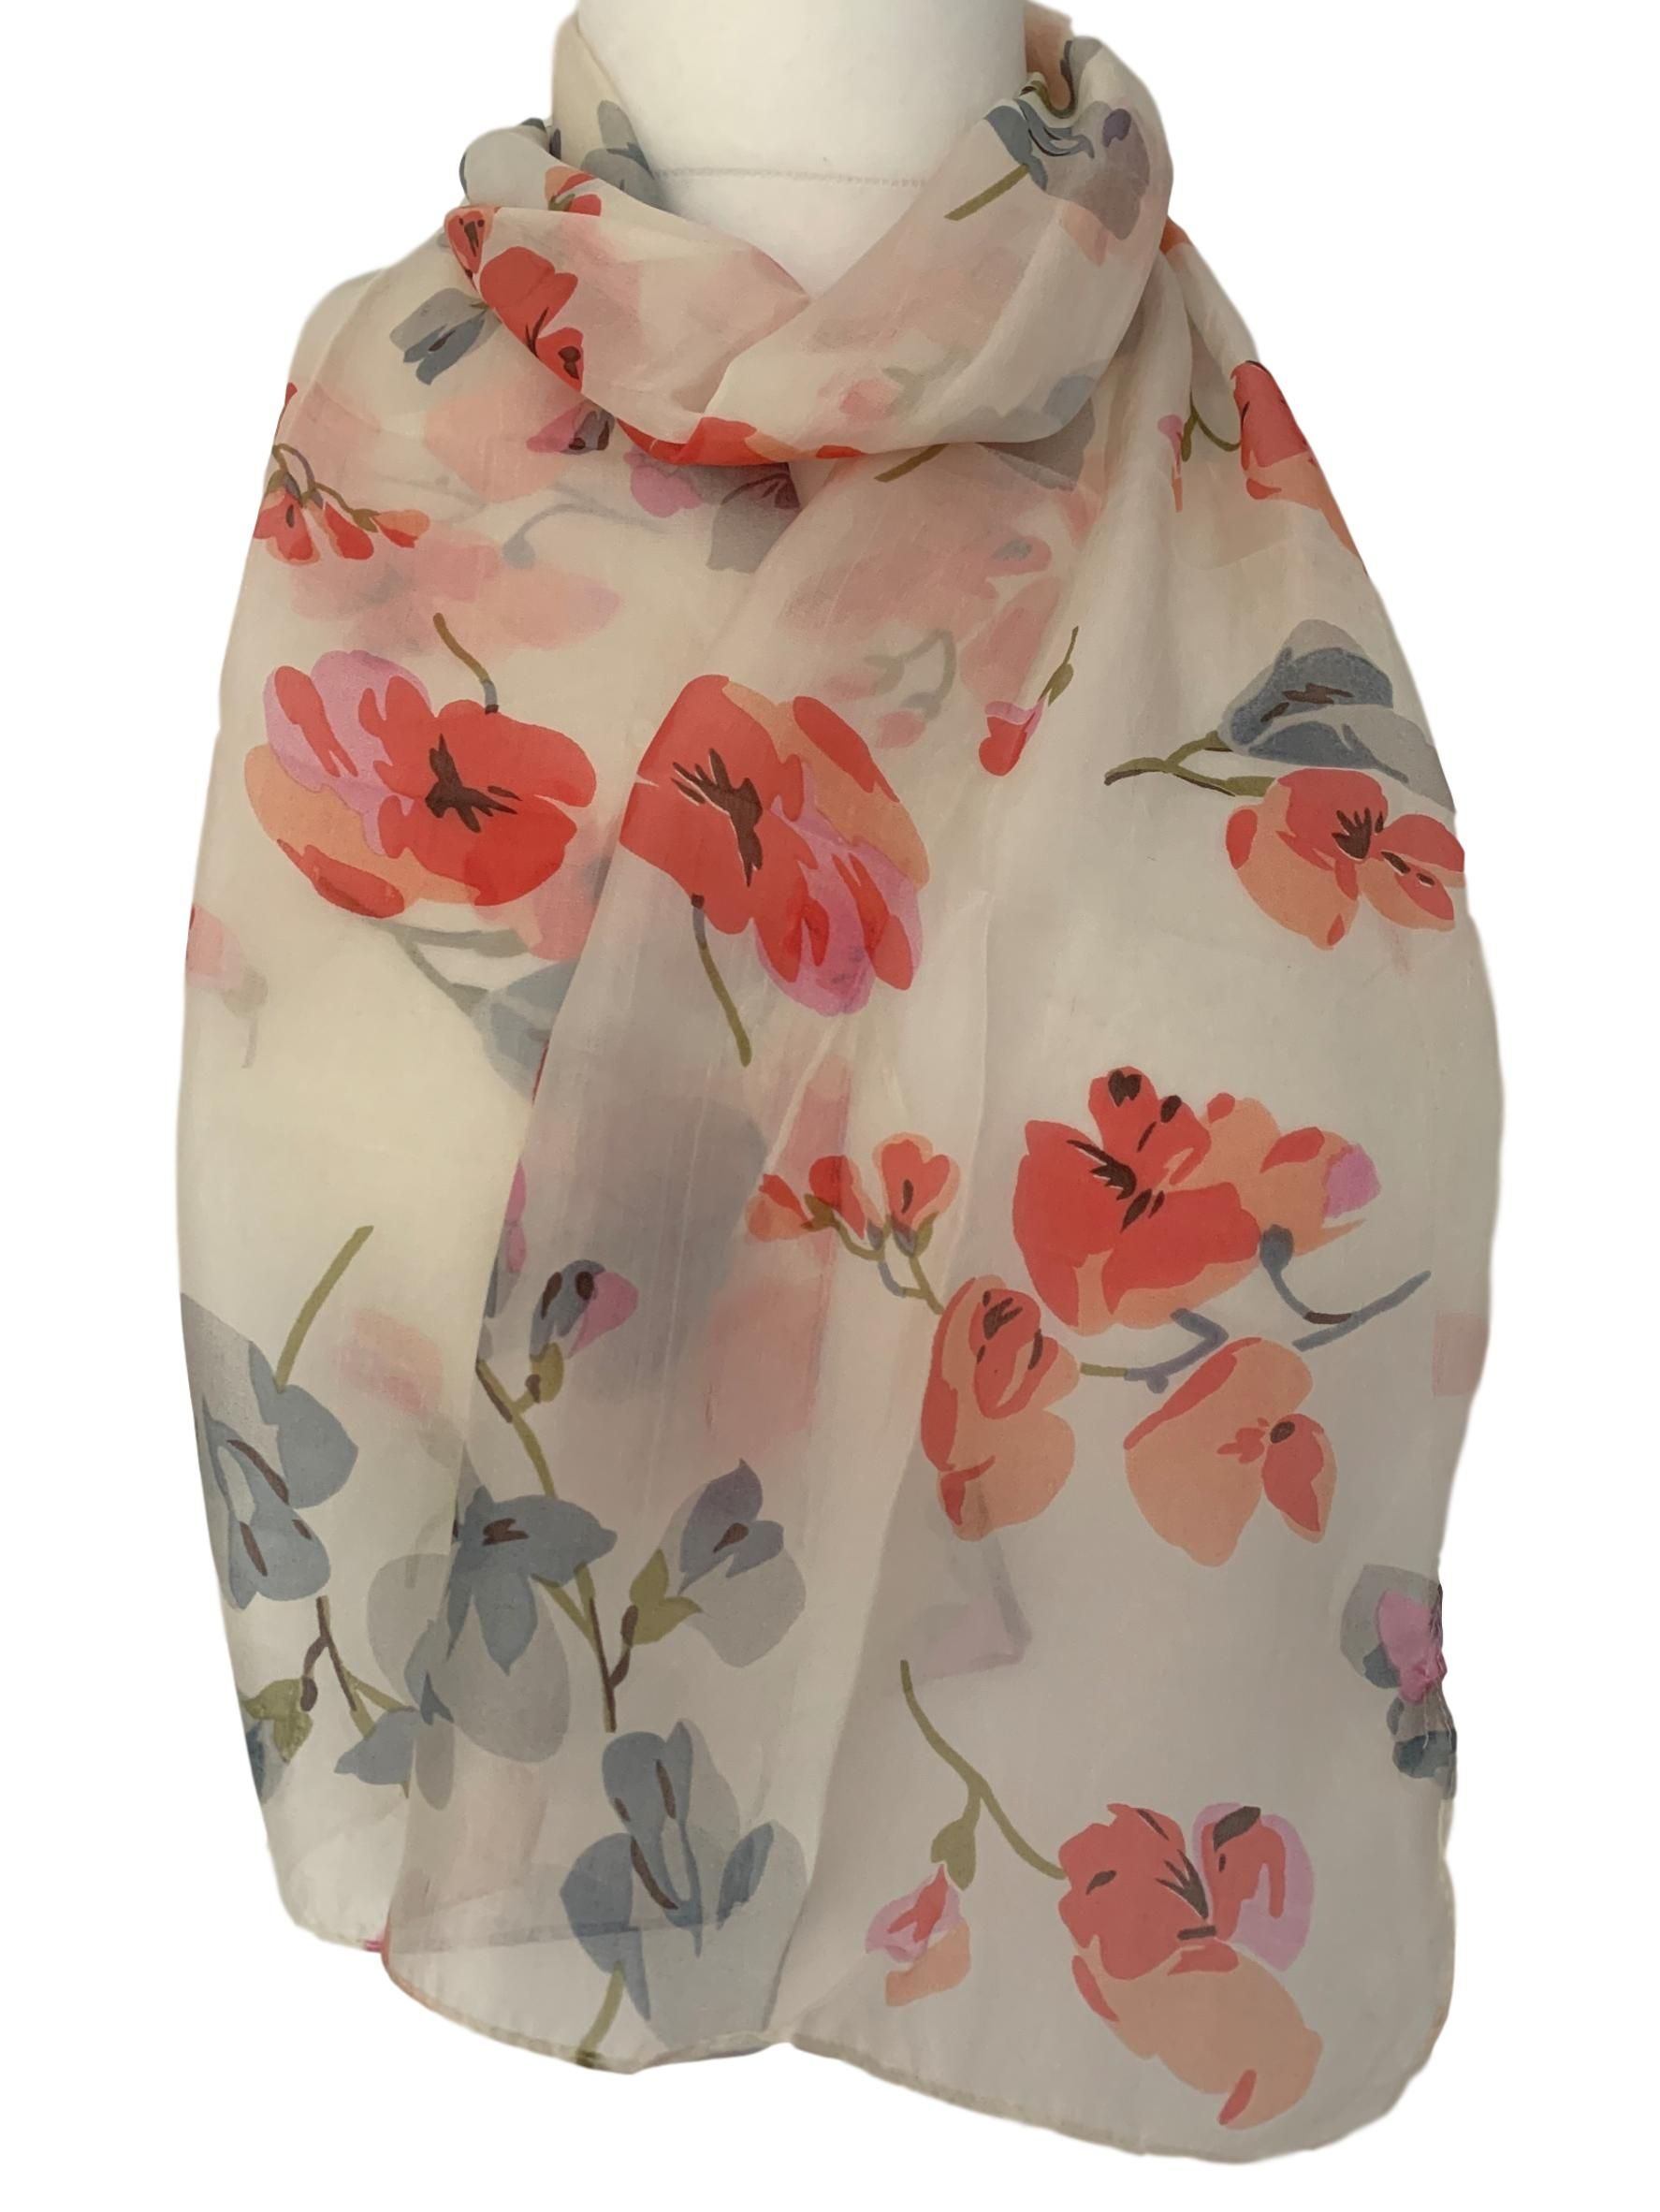 Cream Silk Scarf Pink Grey Floral 100 Pure Silk Ladies Flowers Flower Print In 2020 Grey Floral Pure Silk Scarf Cream Silk